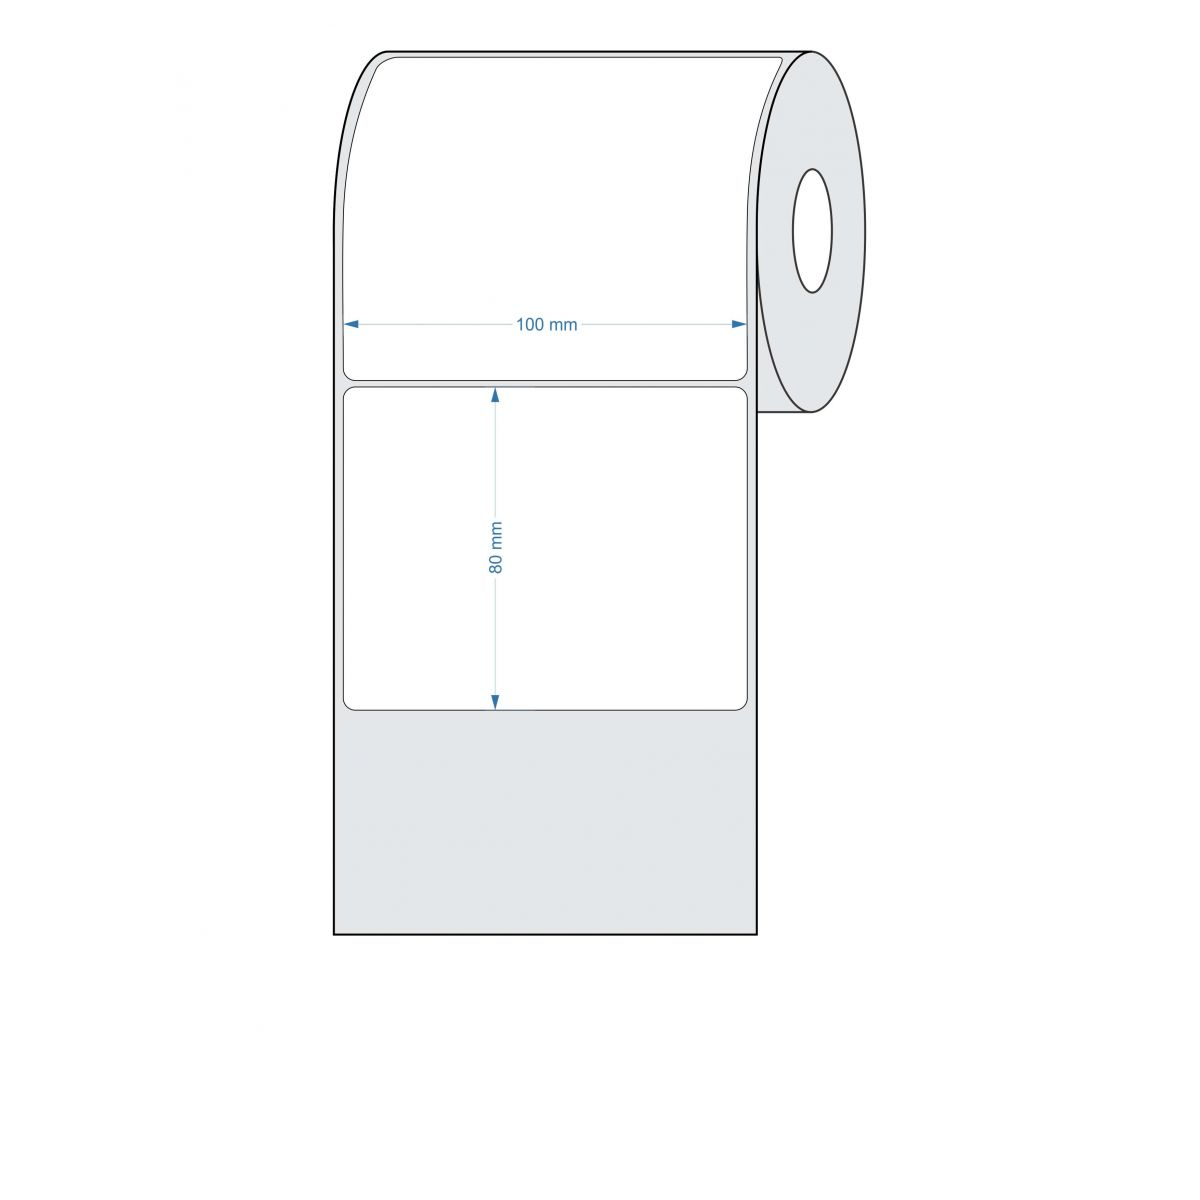 Etiquetas Adesivas 100x80 mm Térmica 32 Metros